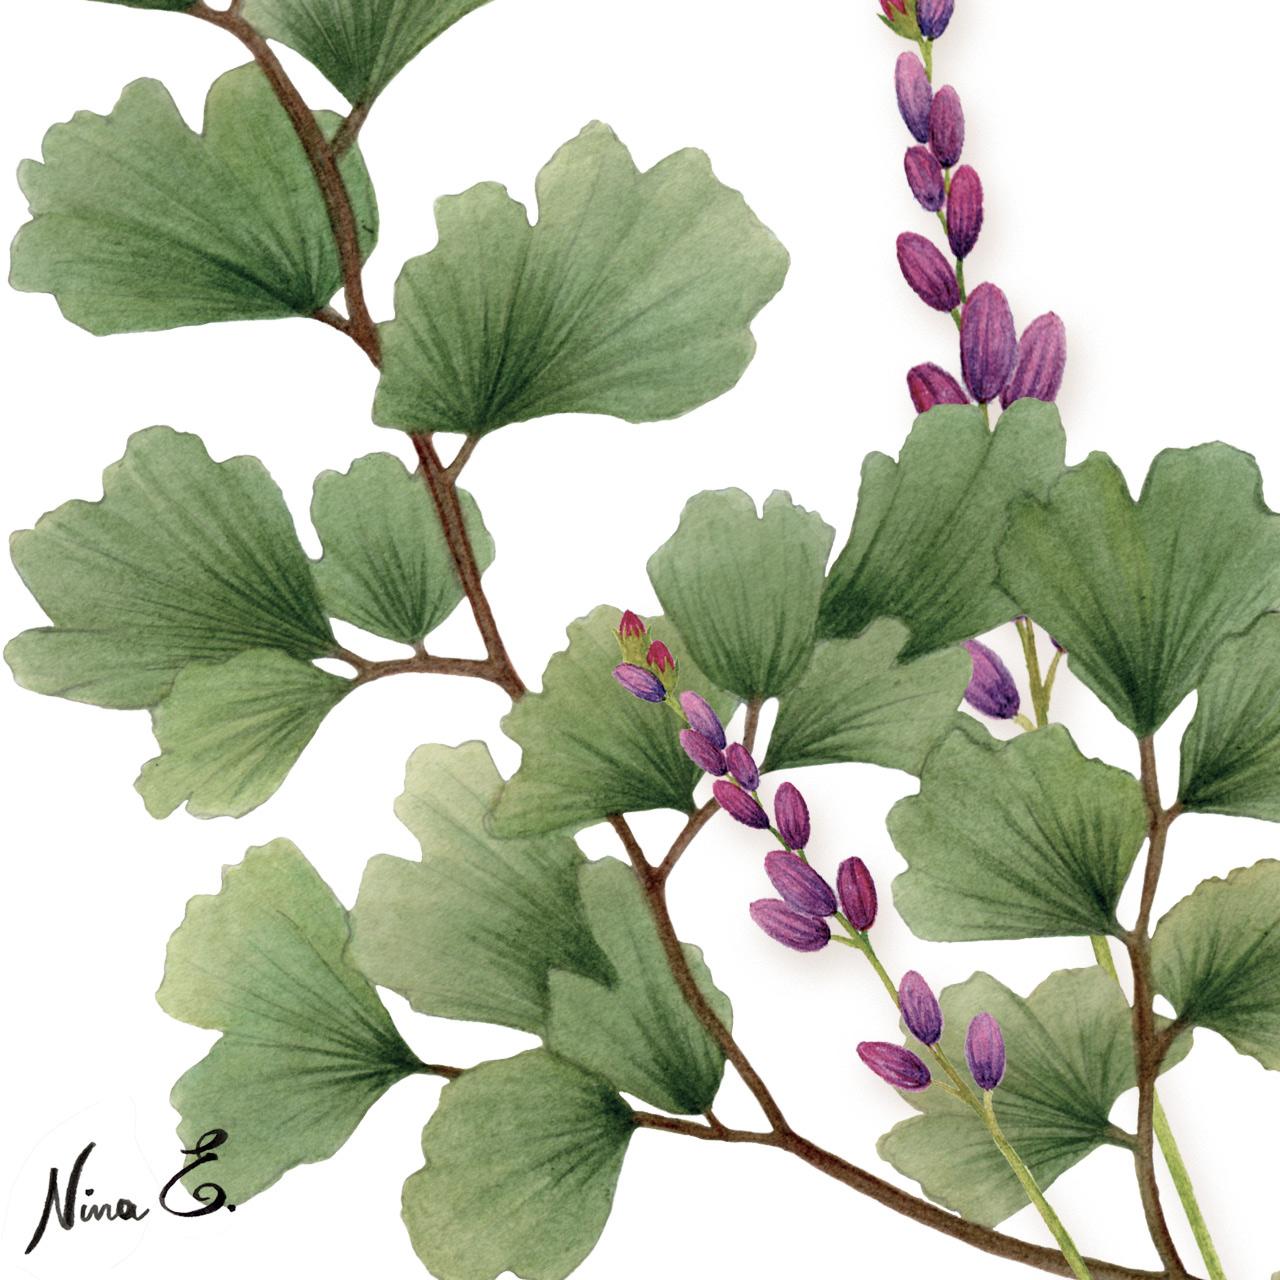 Yume floral watercolors